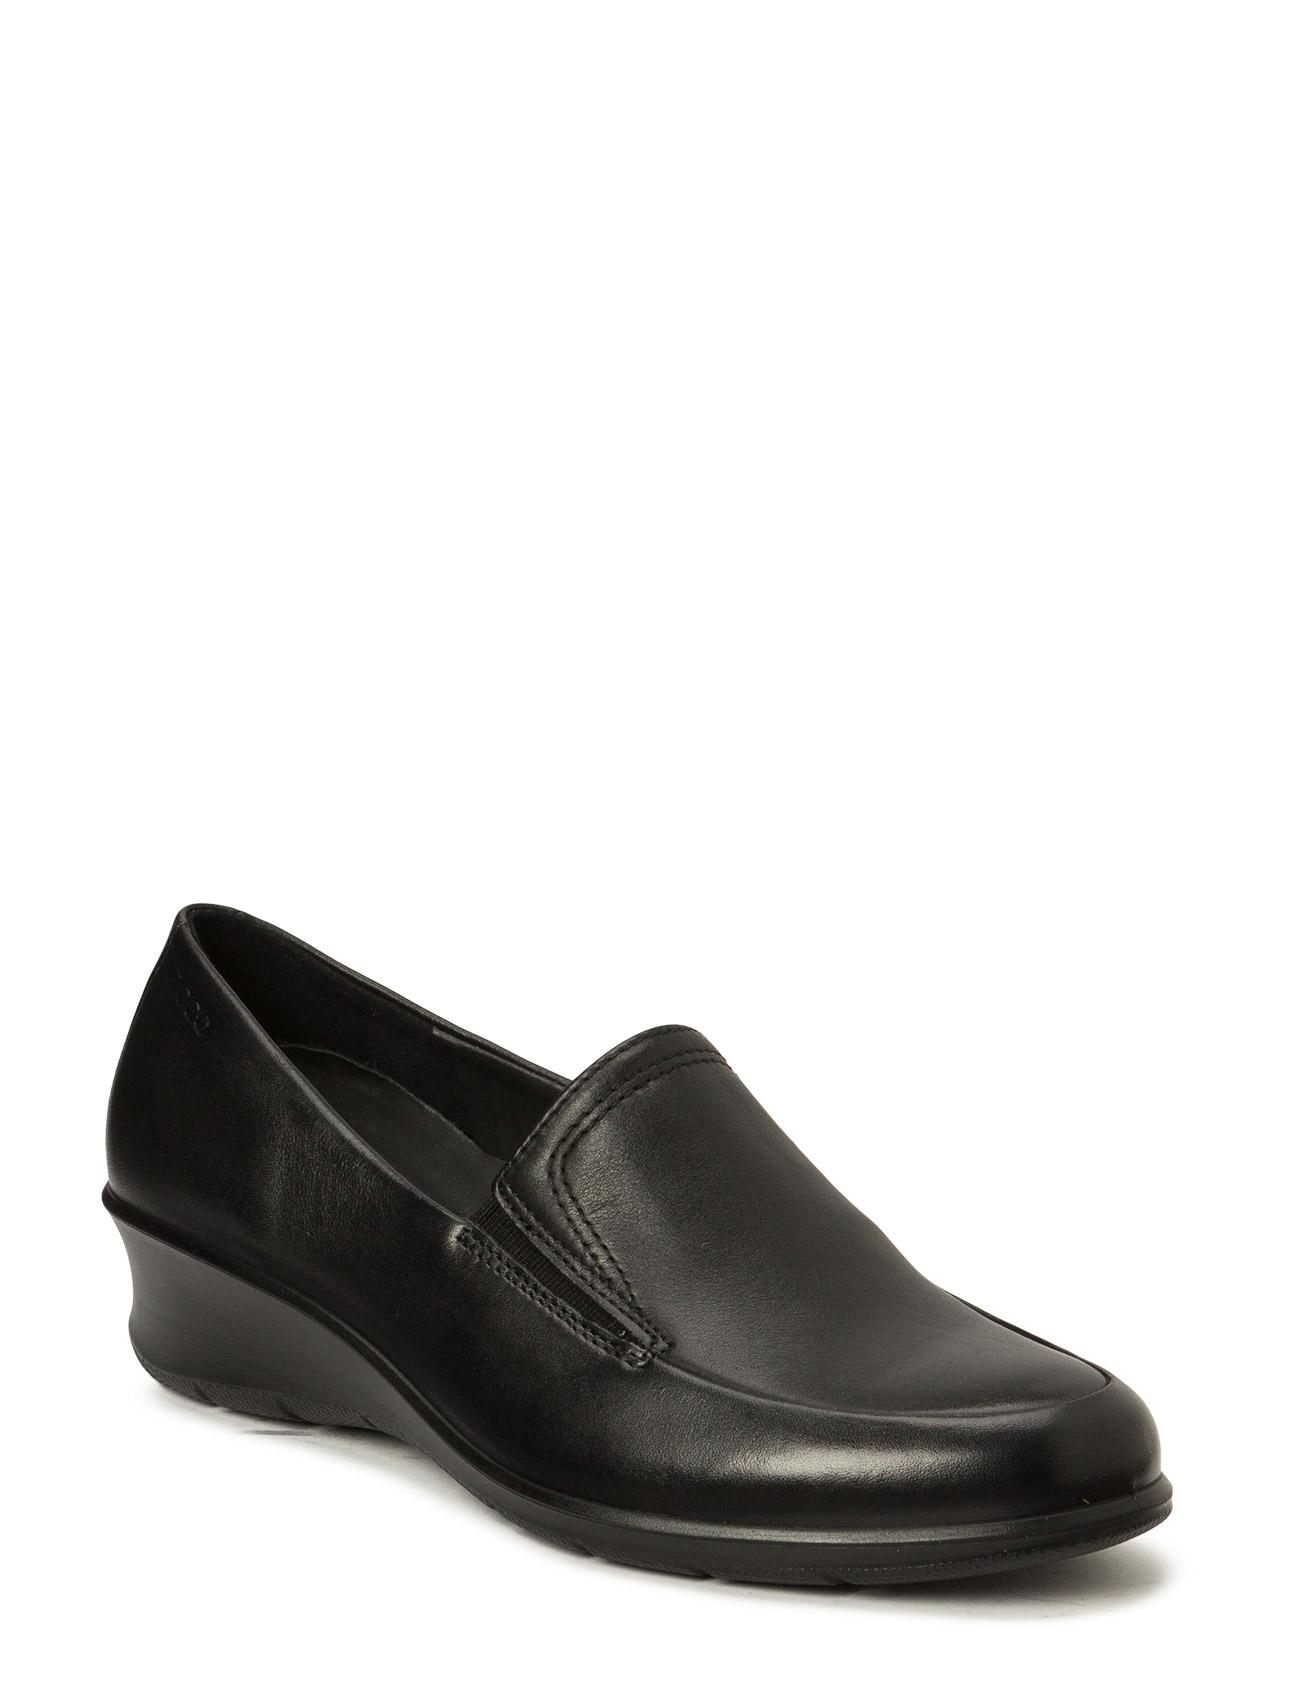 Felicia ECCO Flade sko til Damer i Sort